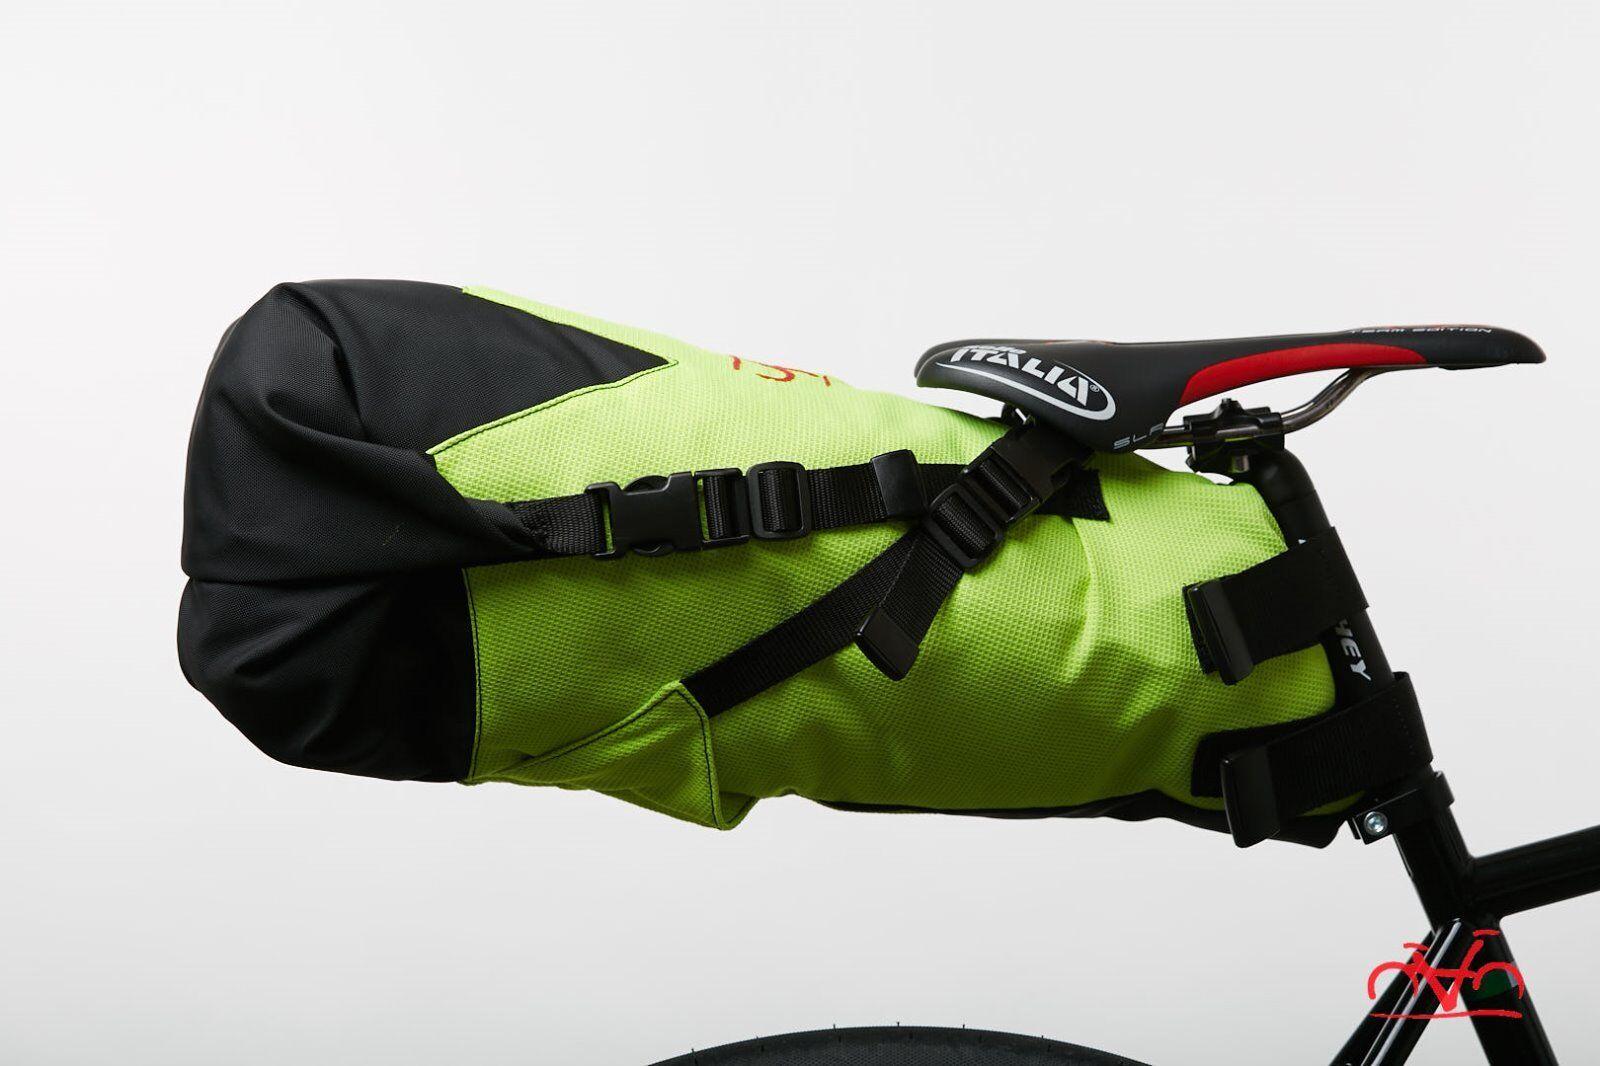 Borsa sottosella, Fahrradpacking, Saddle Tasche 16LT, Agar Fahrrad - Gialla Fluo